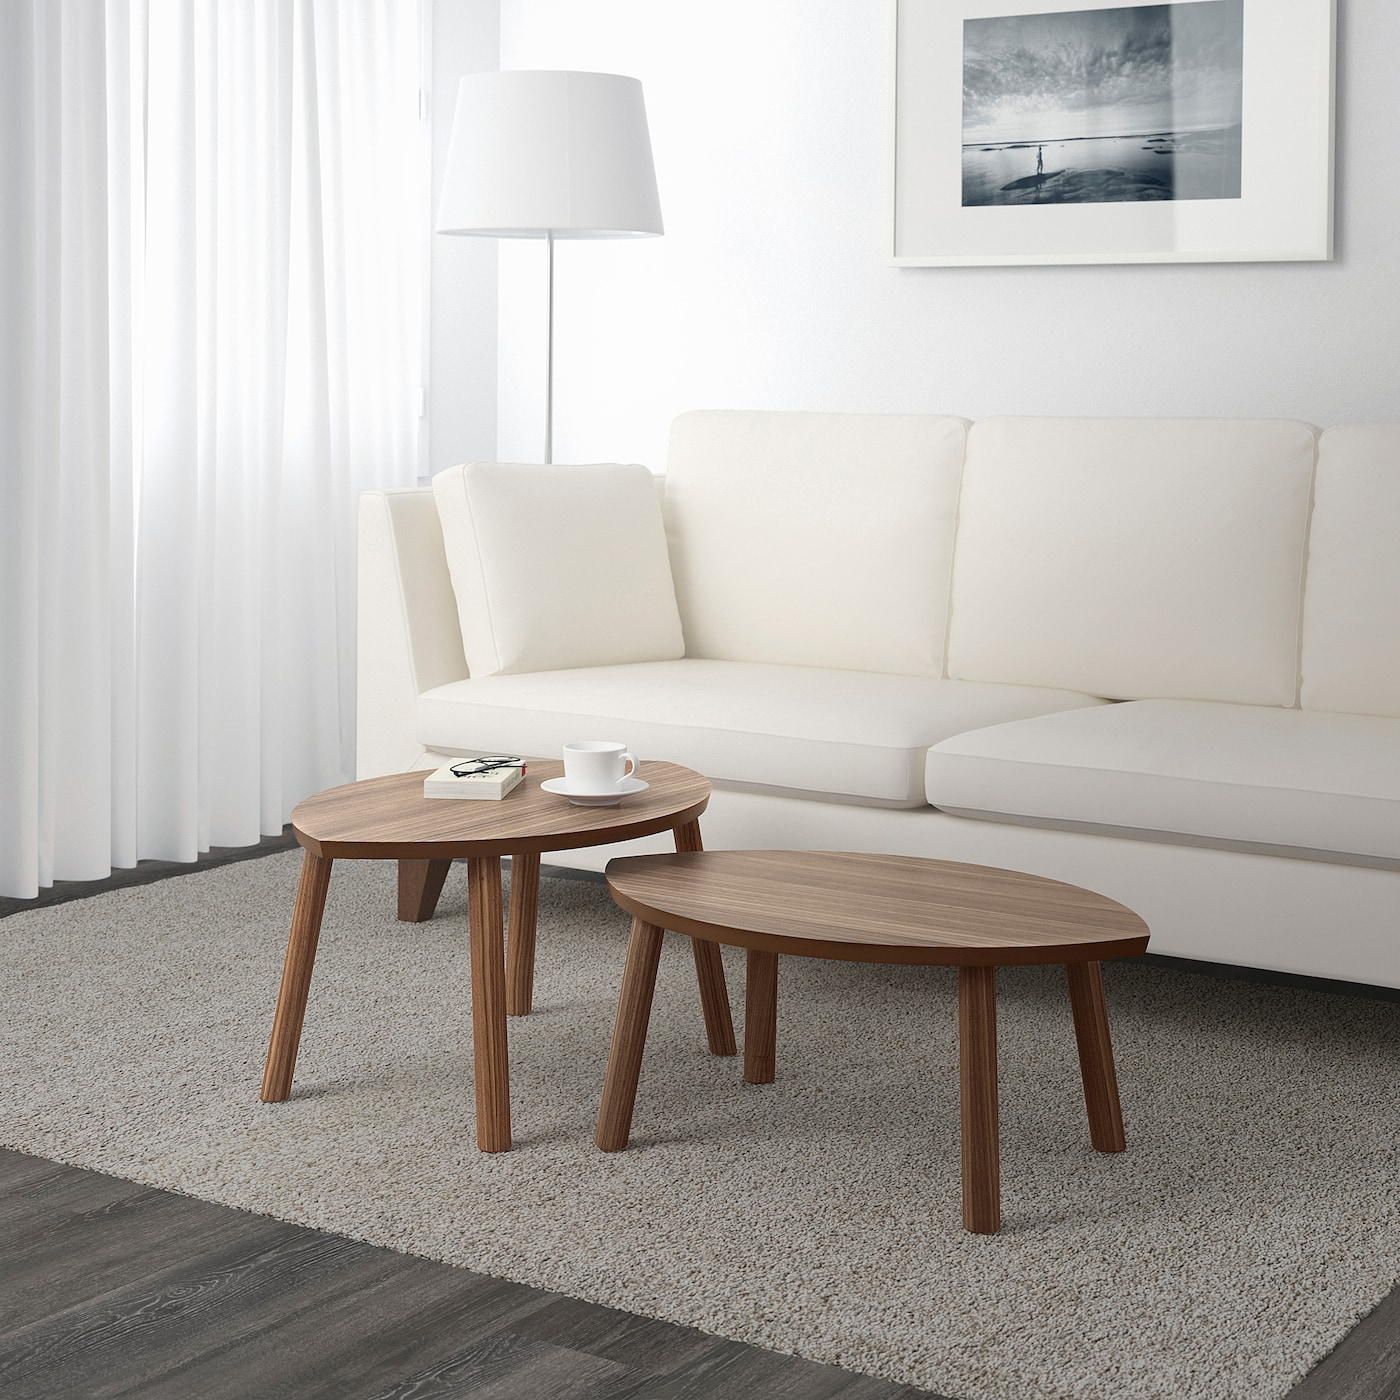 Picture of: Stockholm Nest Of Tables Set Of 2 Walnut Veneer Ikea